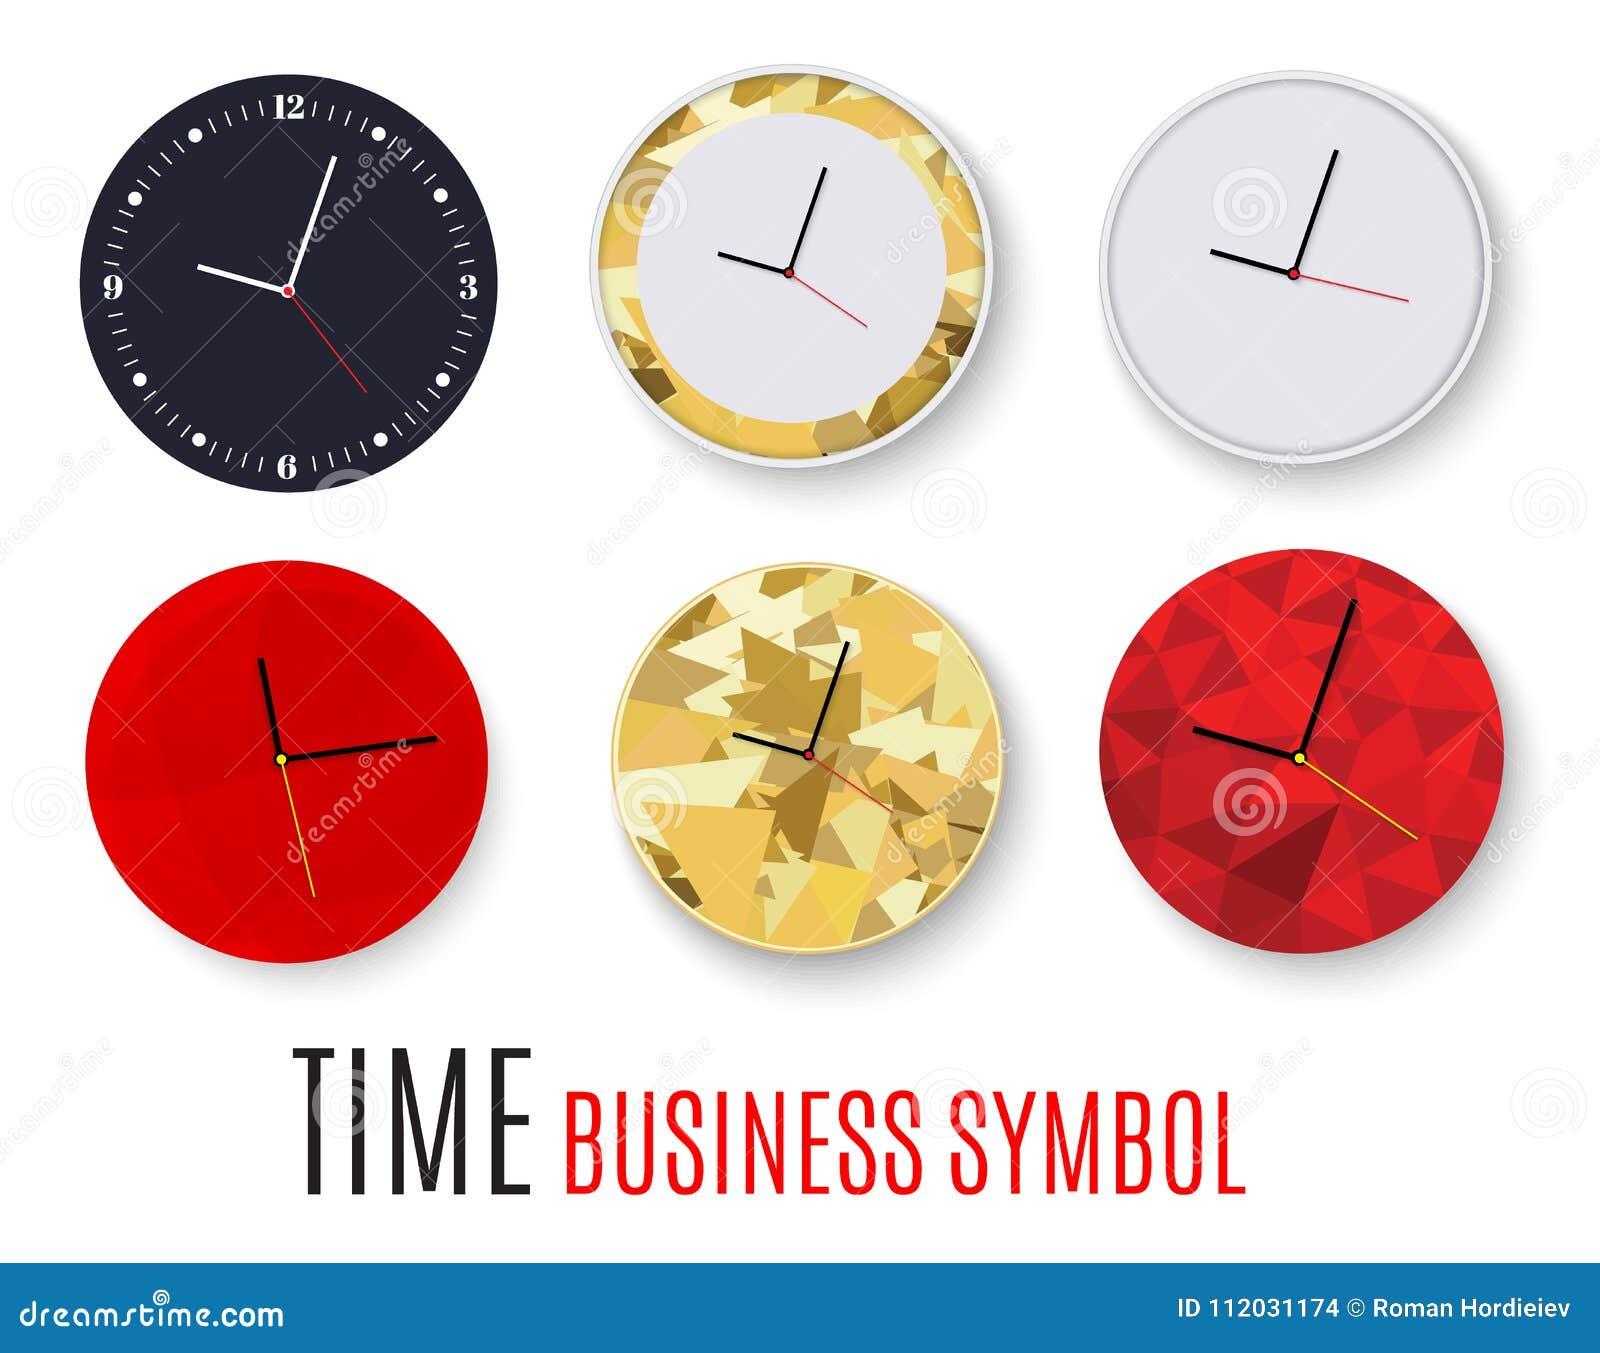 Horloge De Bureau Originale bureau d'horloge murale conception de calibre en plan